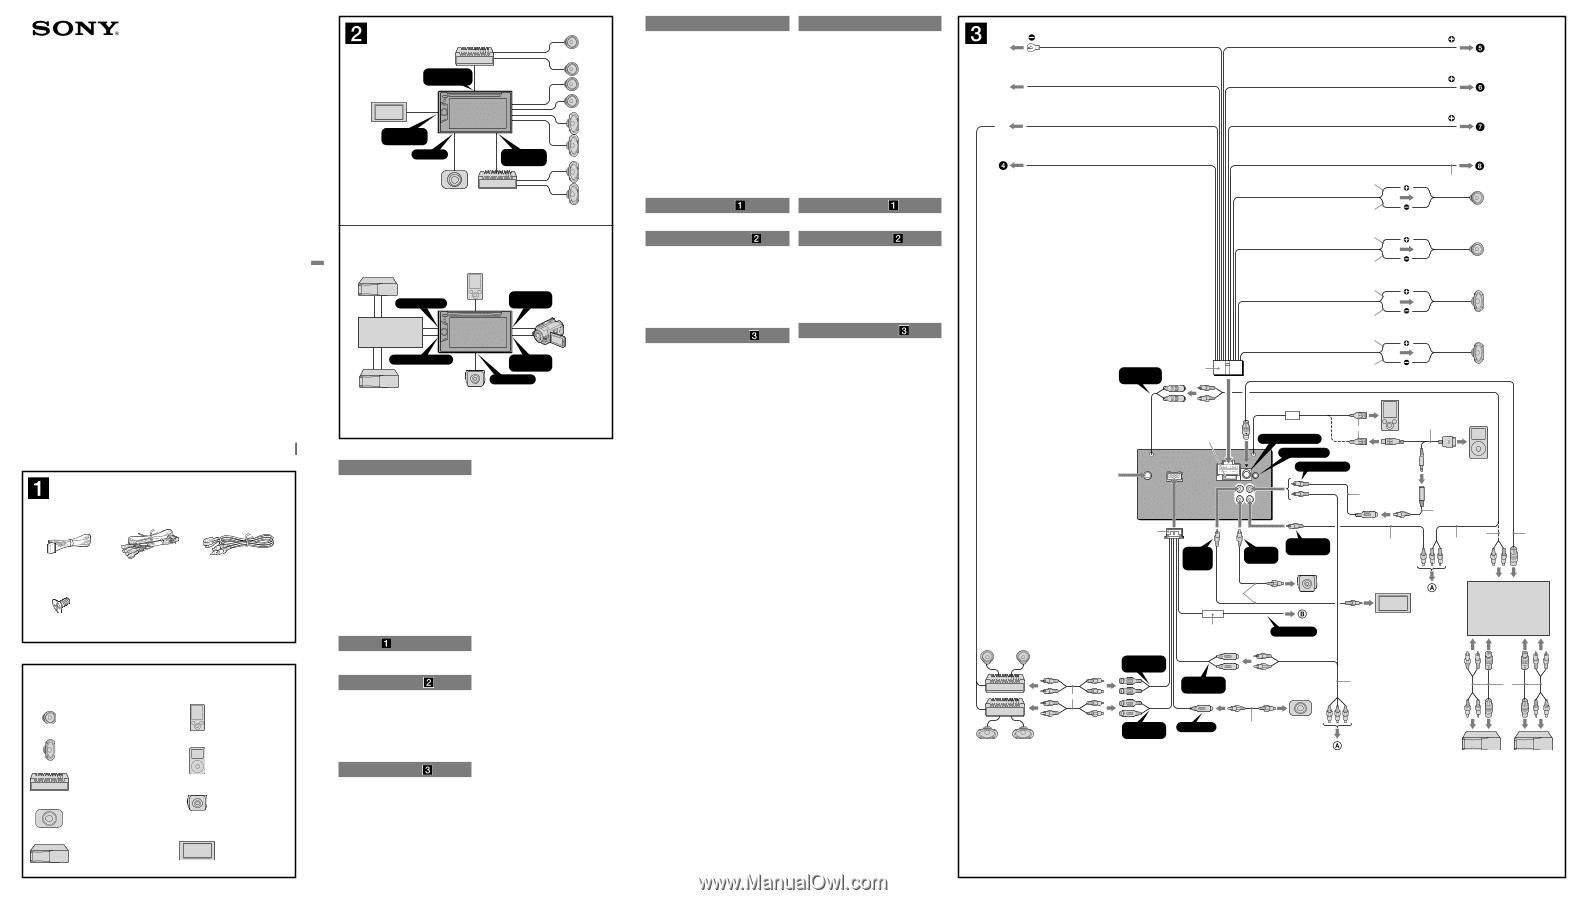 hight resolution of sony mex bt2800 wiring diagram sony wiring harness colors sony xav 60 wiring diagram sony xav 60 wiring diagram